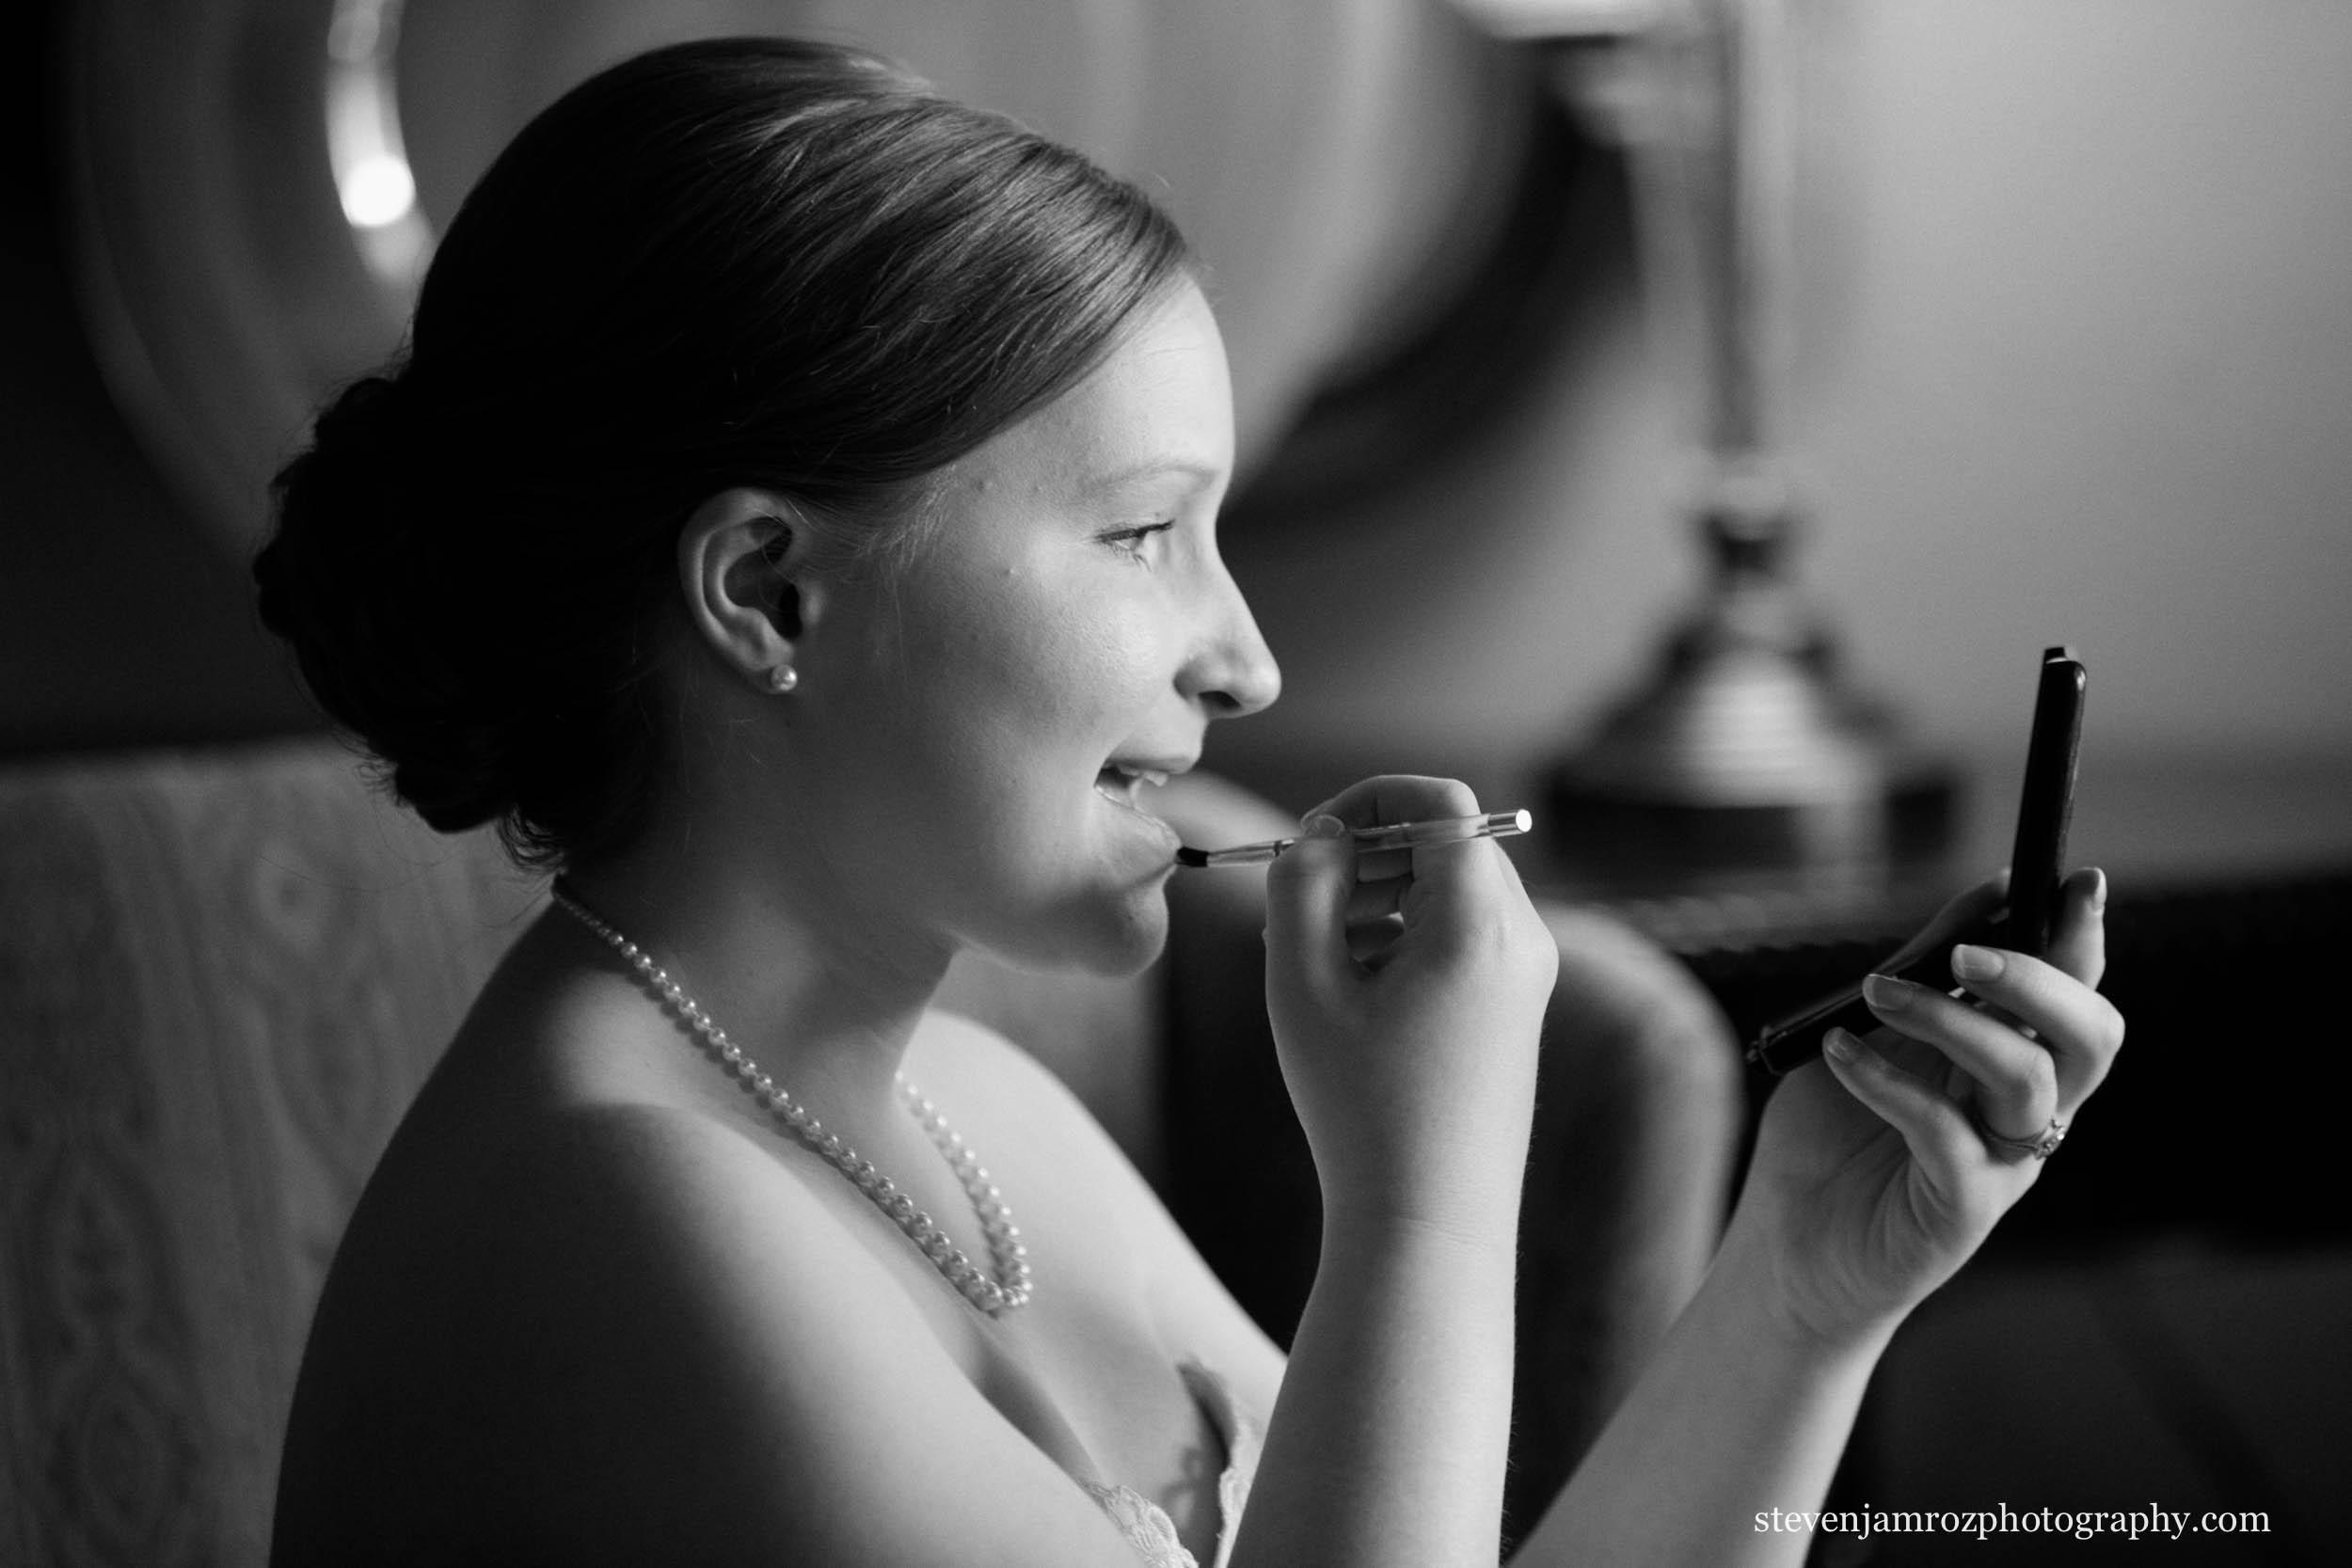 makeup-bride-get-ready-wedding-photography-0933.jpg